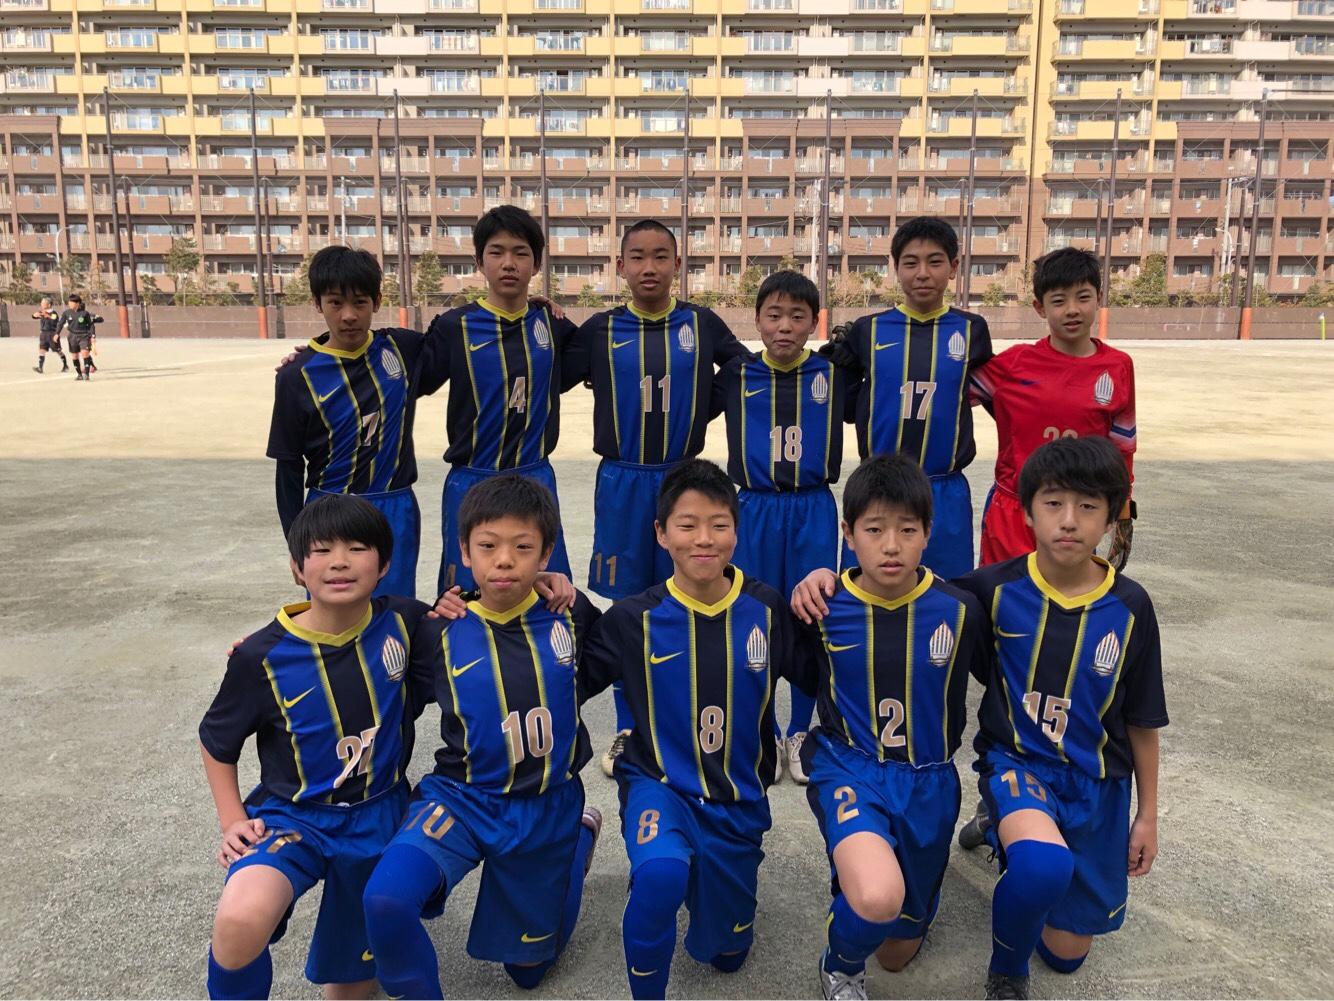 【U13】第22回 千葉県ユース(U-13)サッカー選手権大会  ブロック予選2次リーグ 第2戦